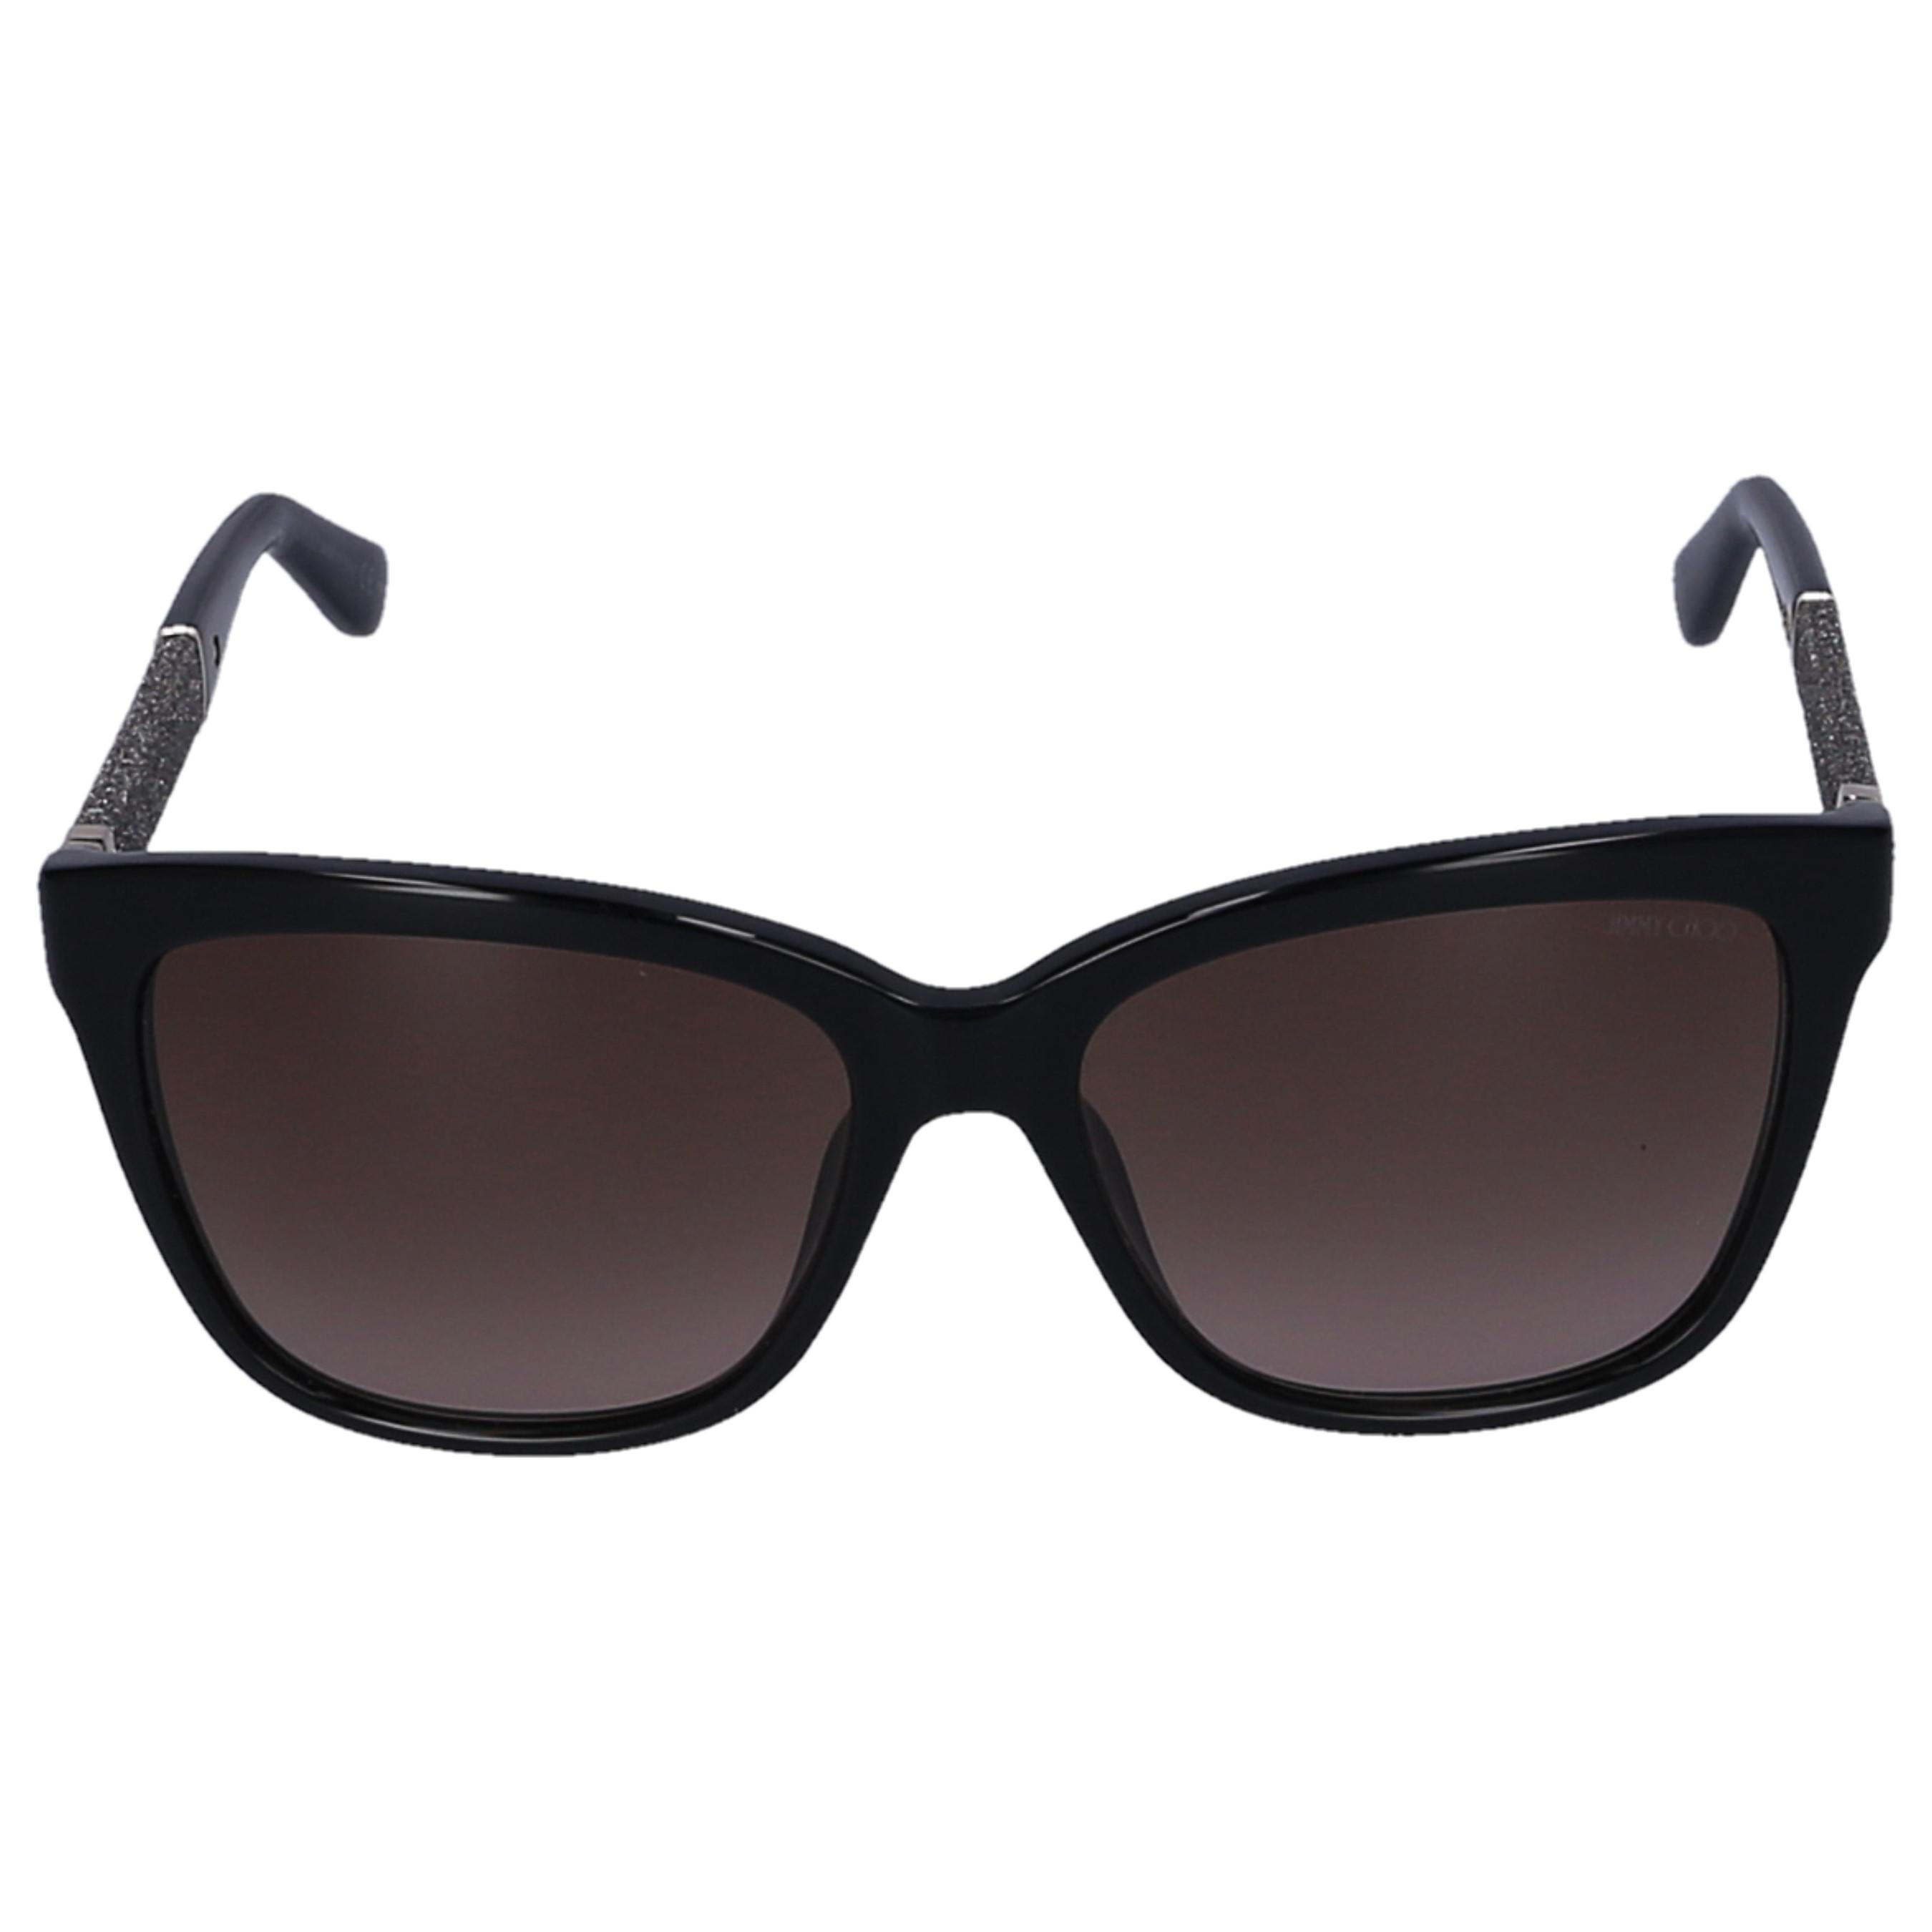 49598d6fe3b Jimmy Choo Women Sunglasses Avaiator Soreai Acetate Tortoise Brown ...